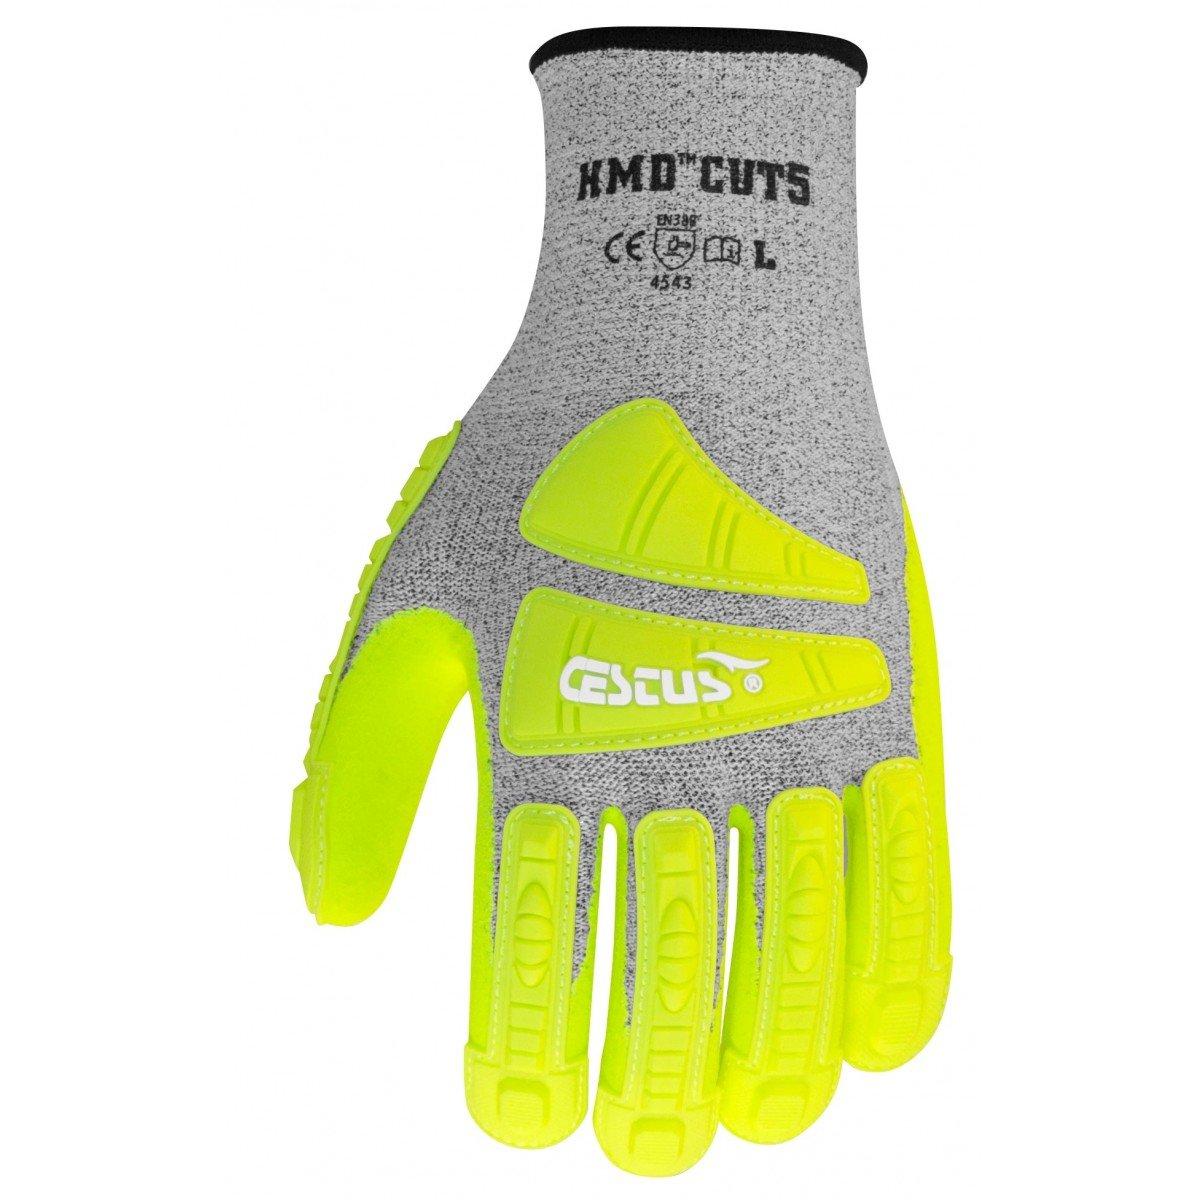 Cestus 3006 2XL HMD CUT5 - Oil and Gas Glove, 2